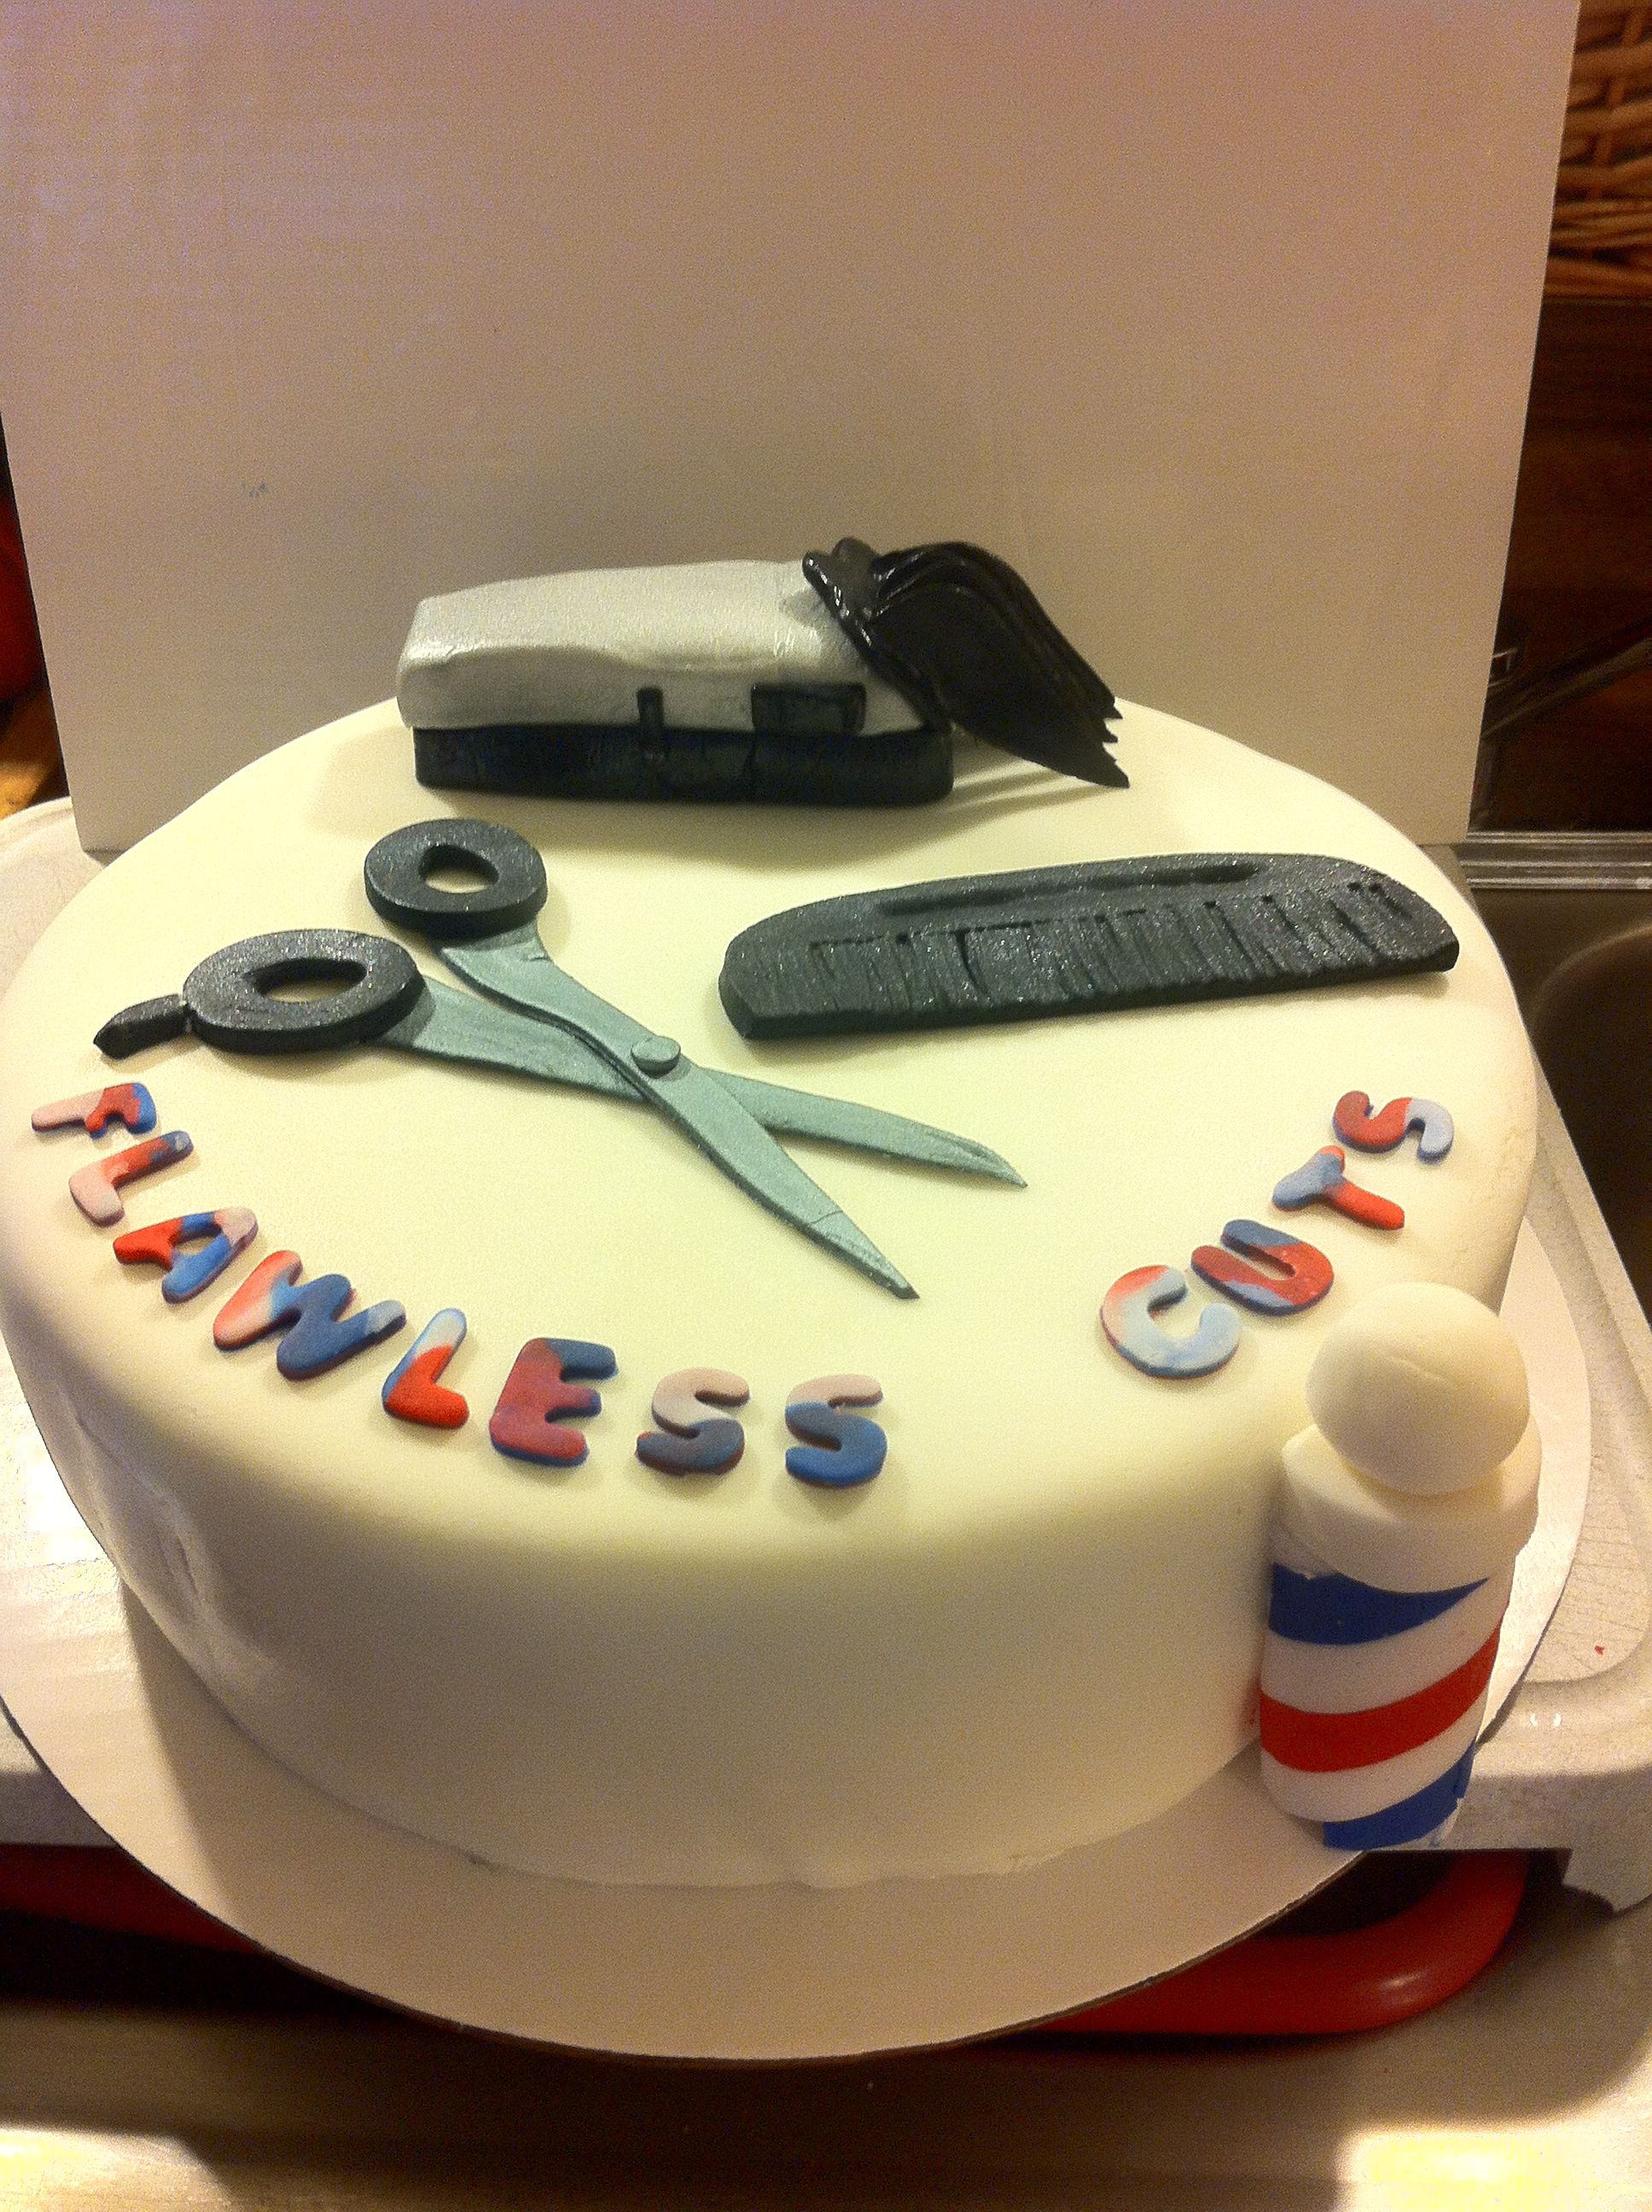 Barber Shop Designs Cake Ideas And Designs